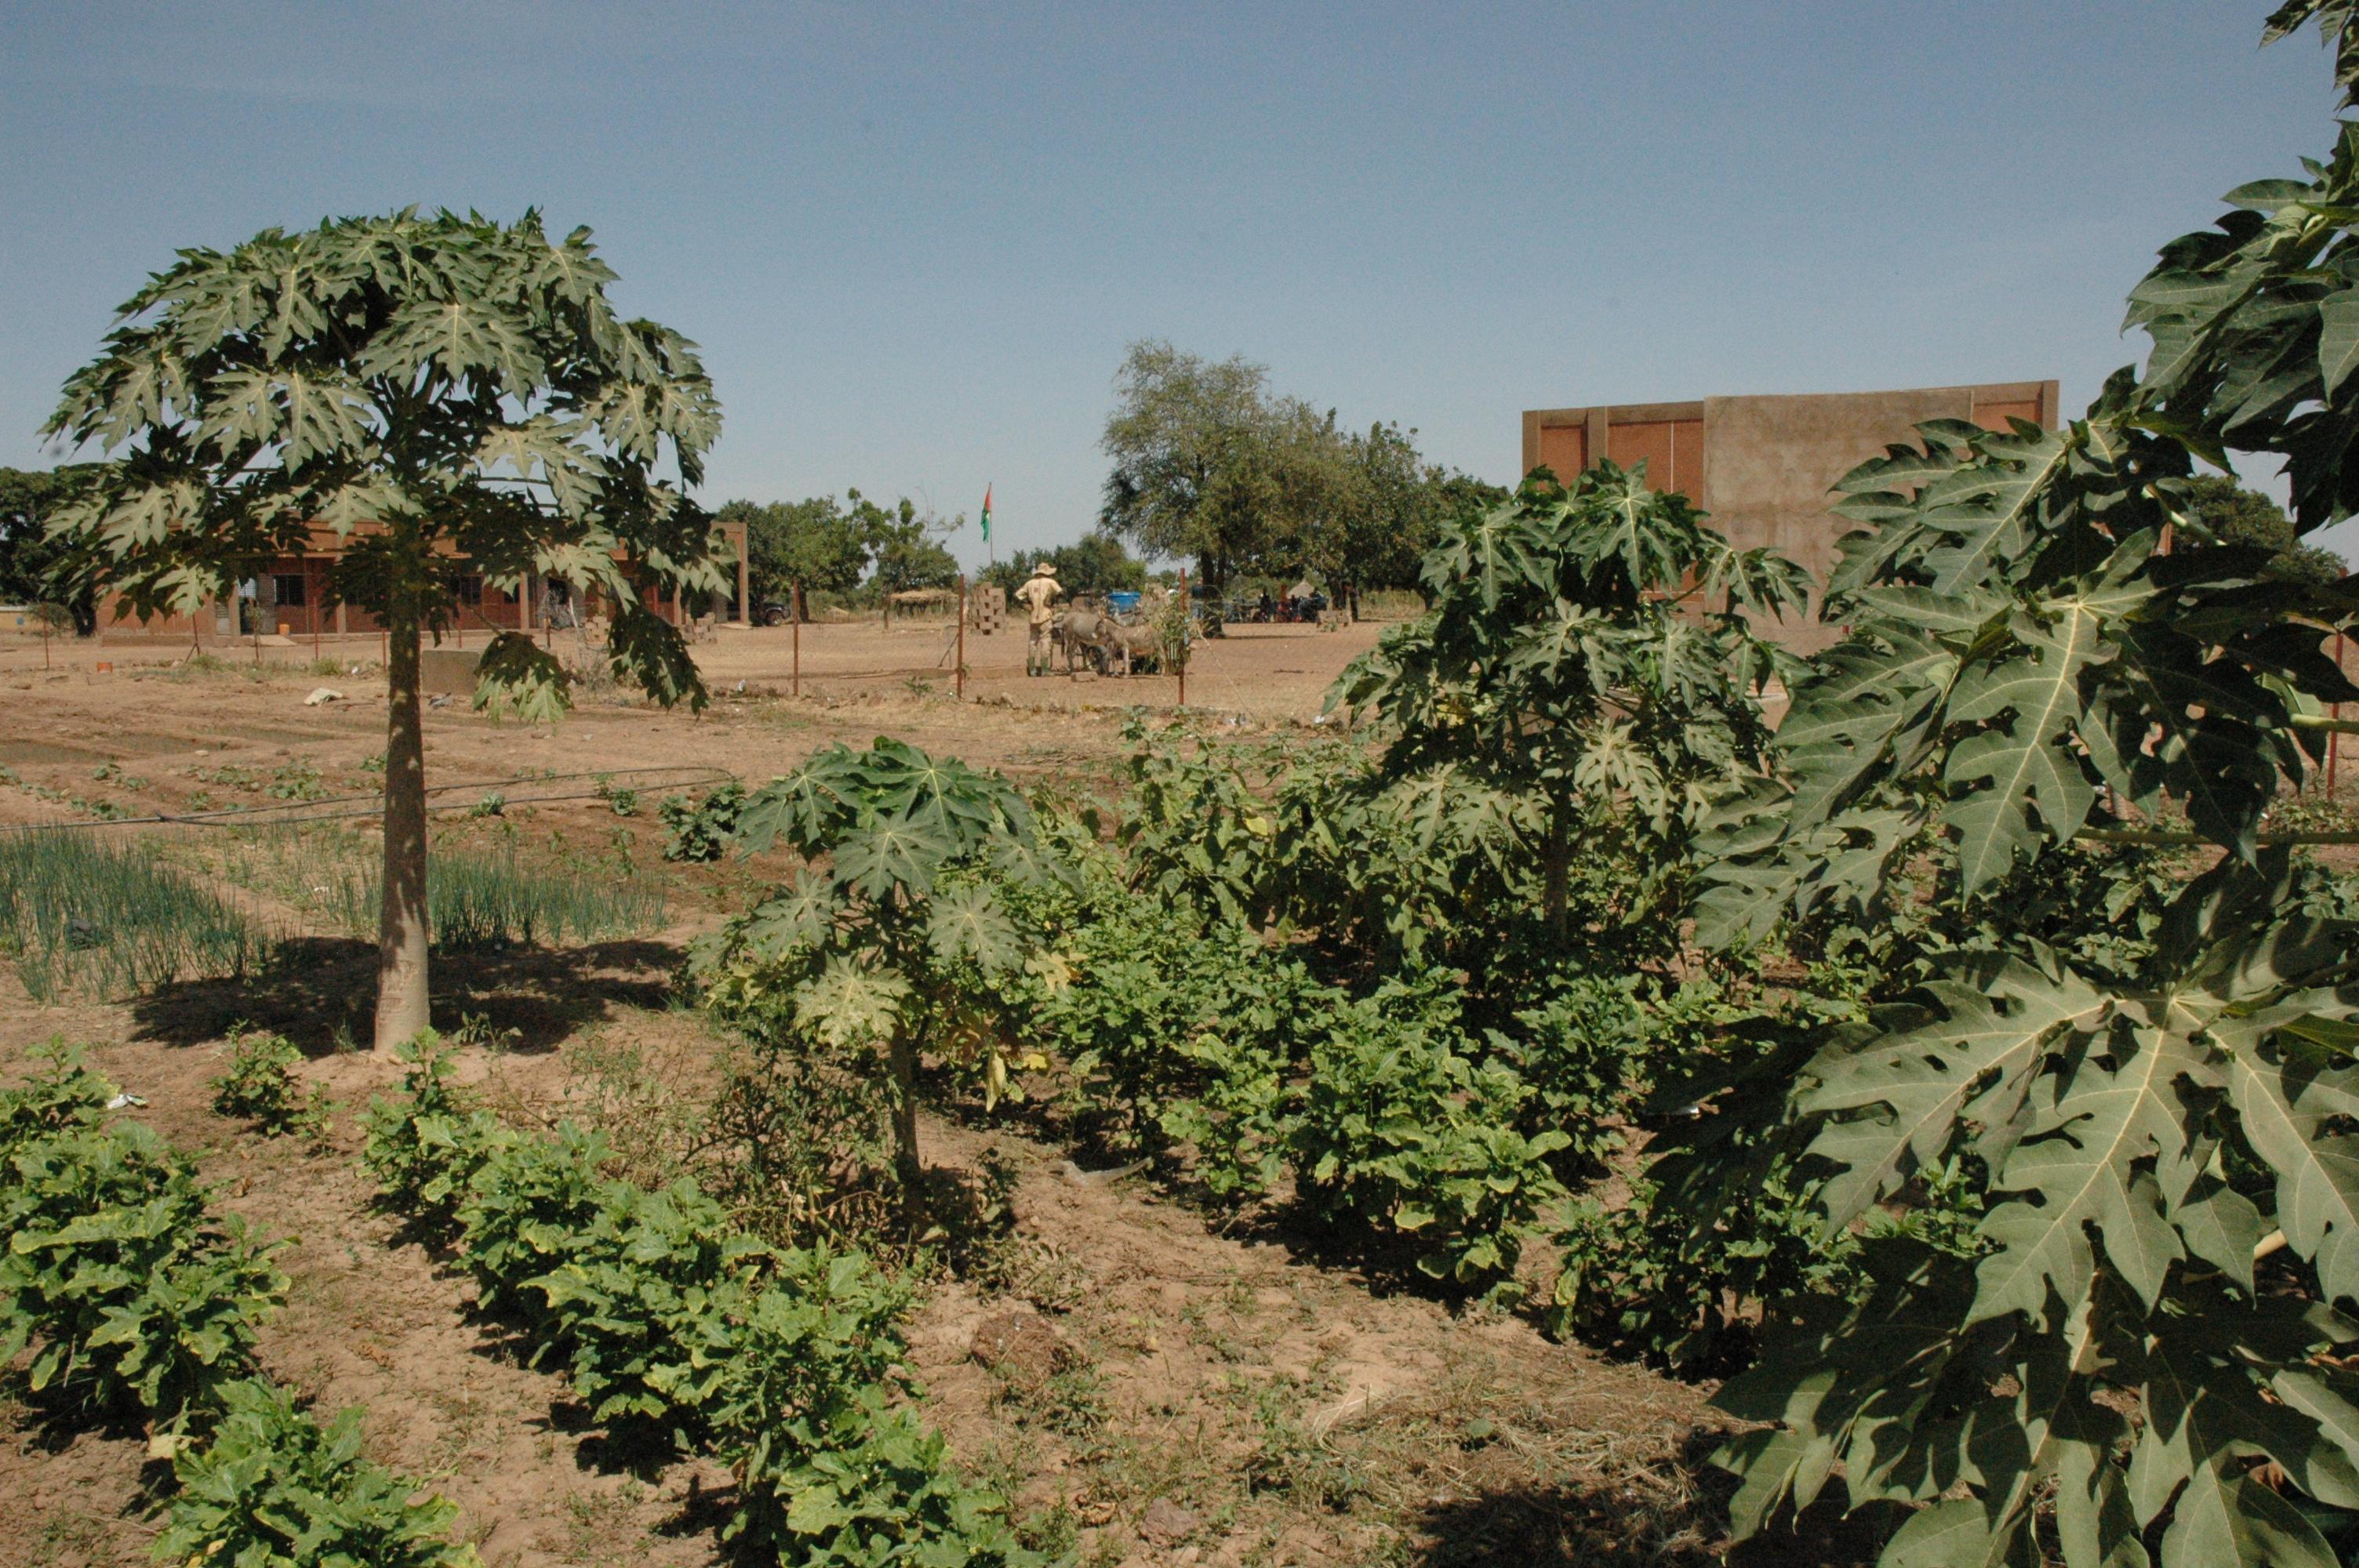 Jardin de l'école de Kiendsom